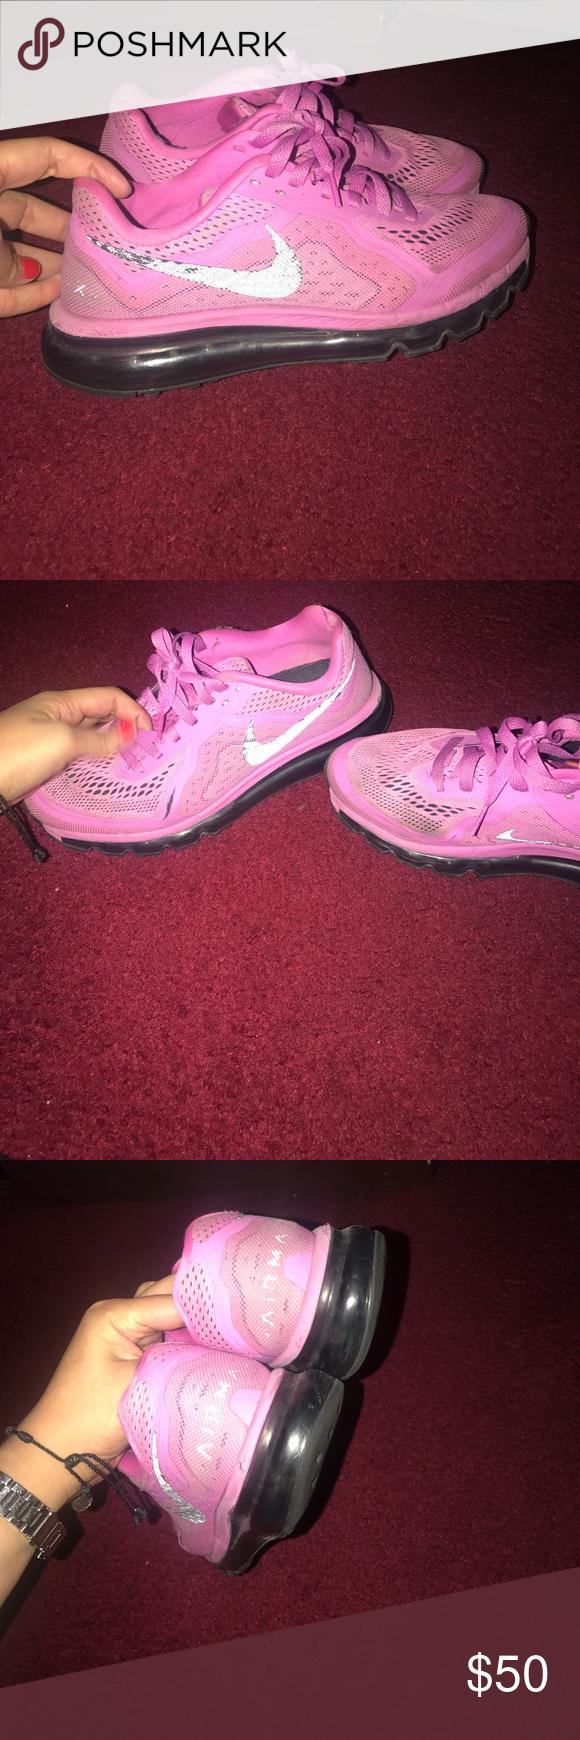 nike air max rosa viola, colore rosa porpora, air max e scarpe da ginnastica